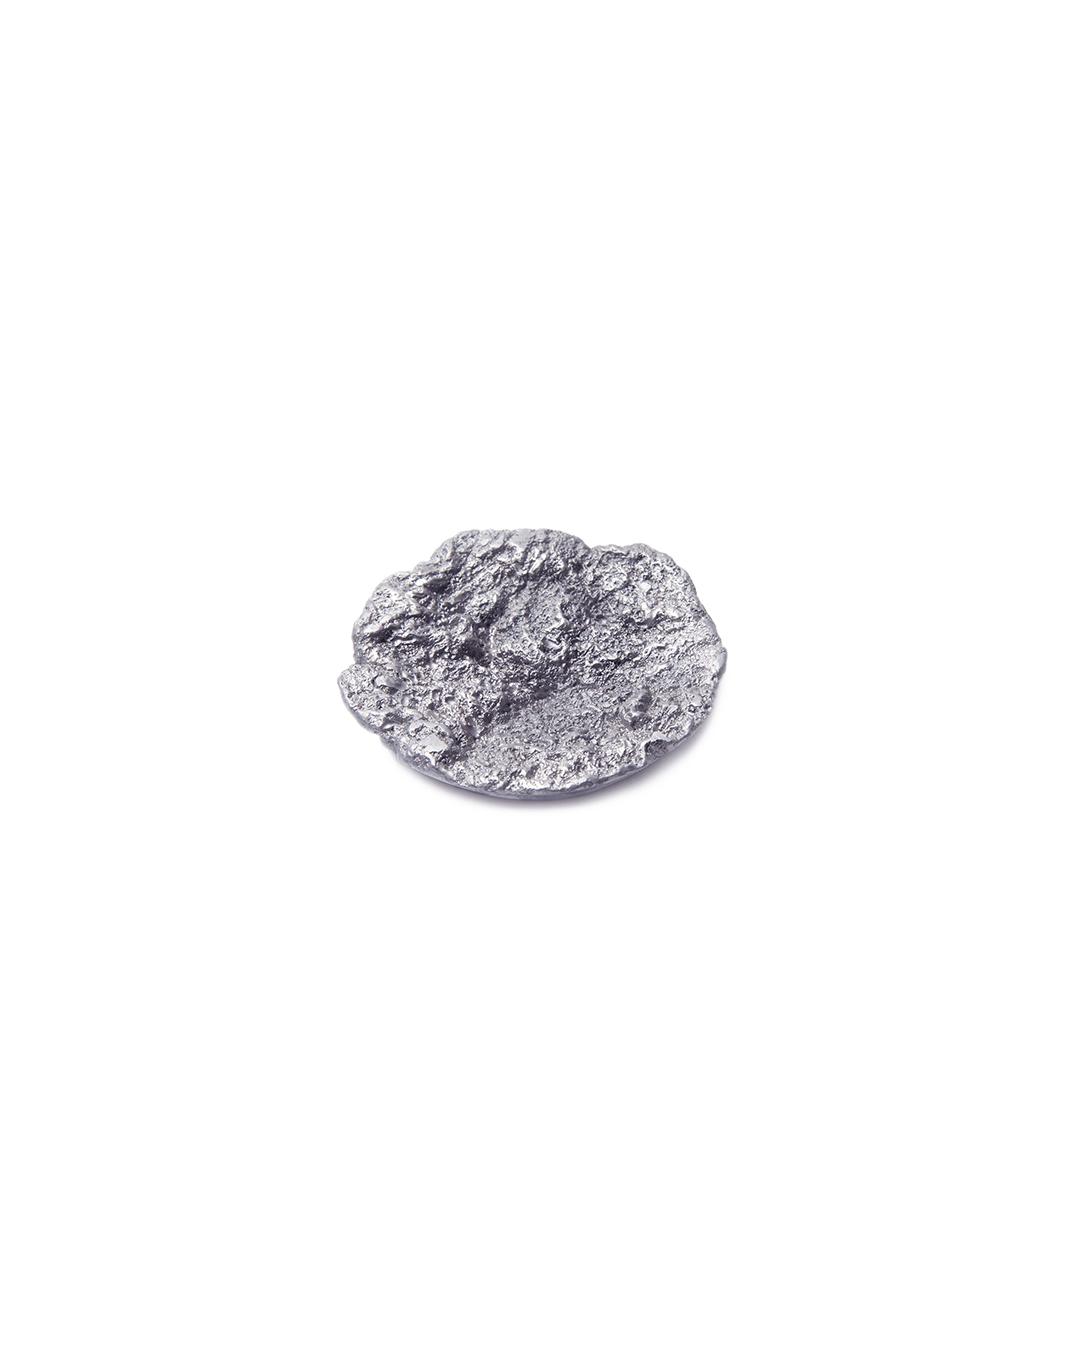 Barbara Schrobenhauser, Drawn to it I, 2015, brooch; aluminium, stainless steel, 45 x 45 x 10 mm, €485